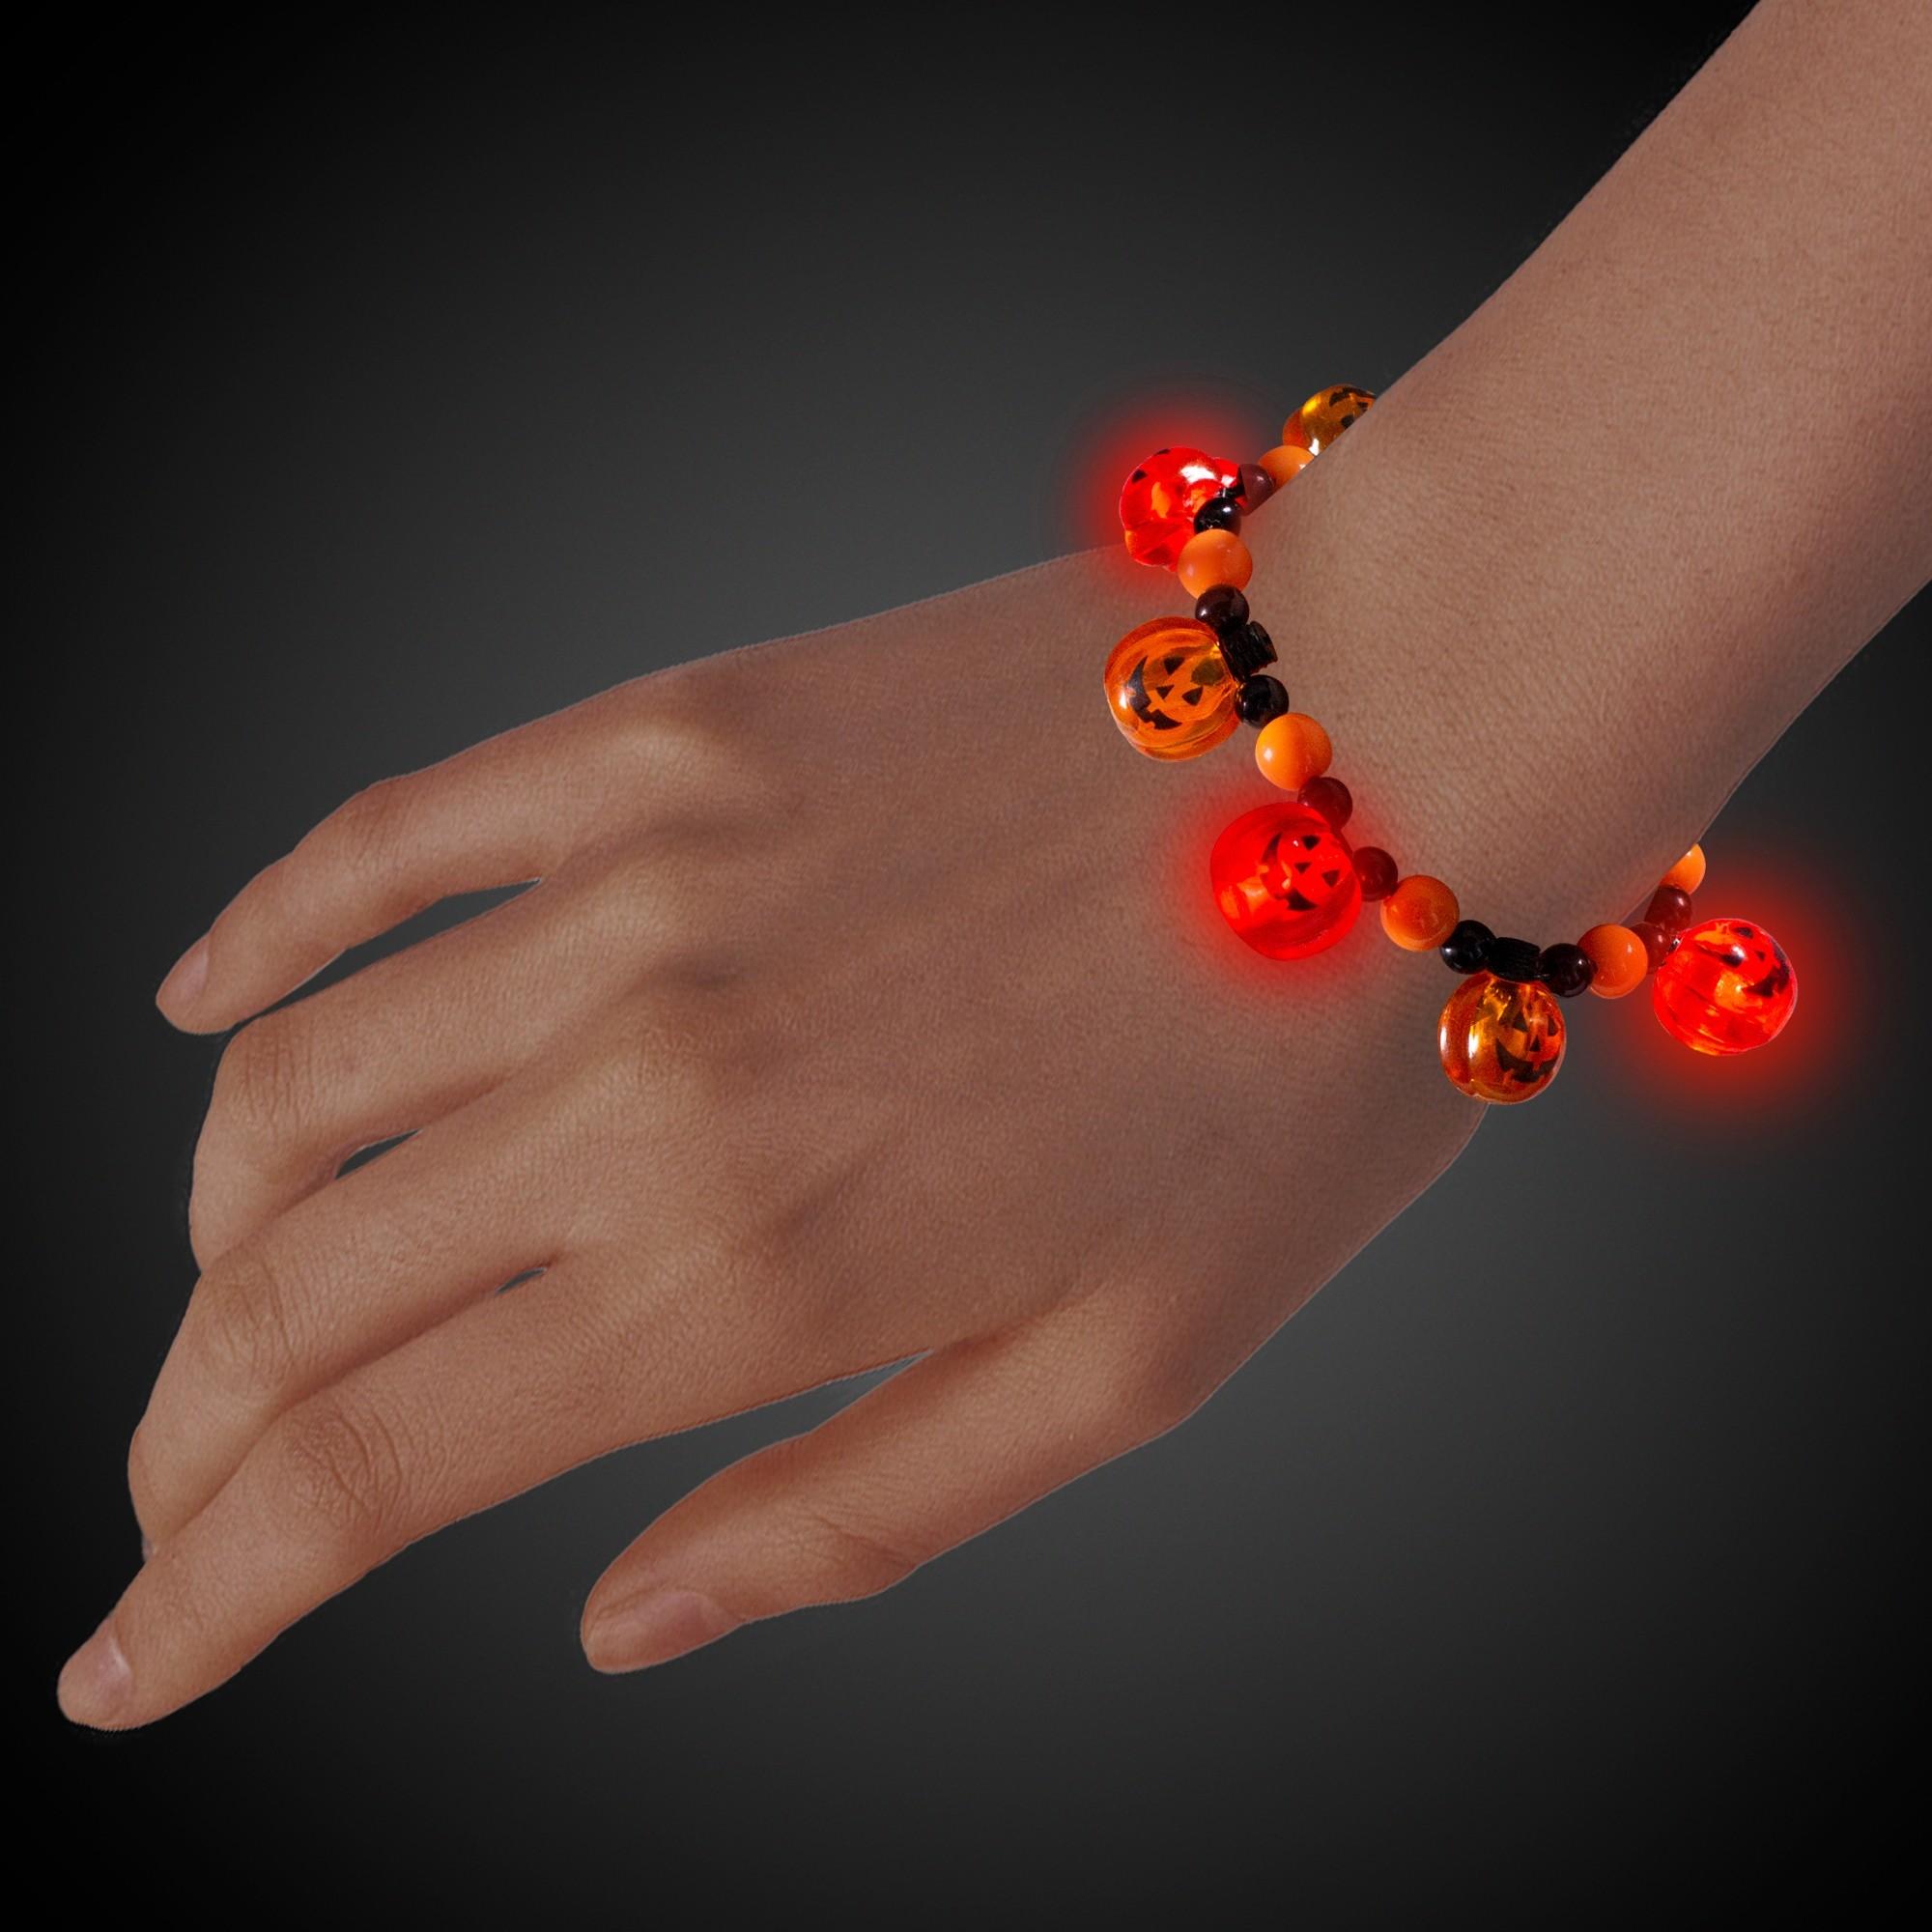 LED Pumpkin Bead Bracelet